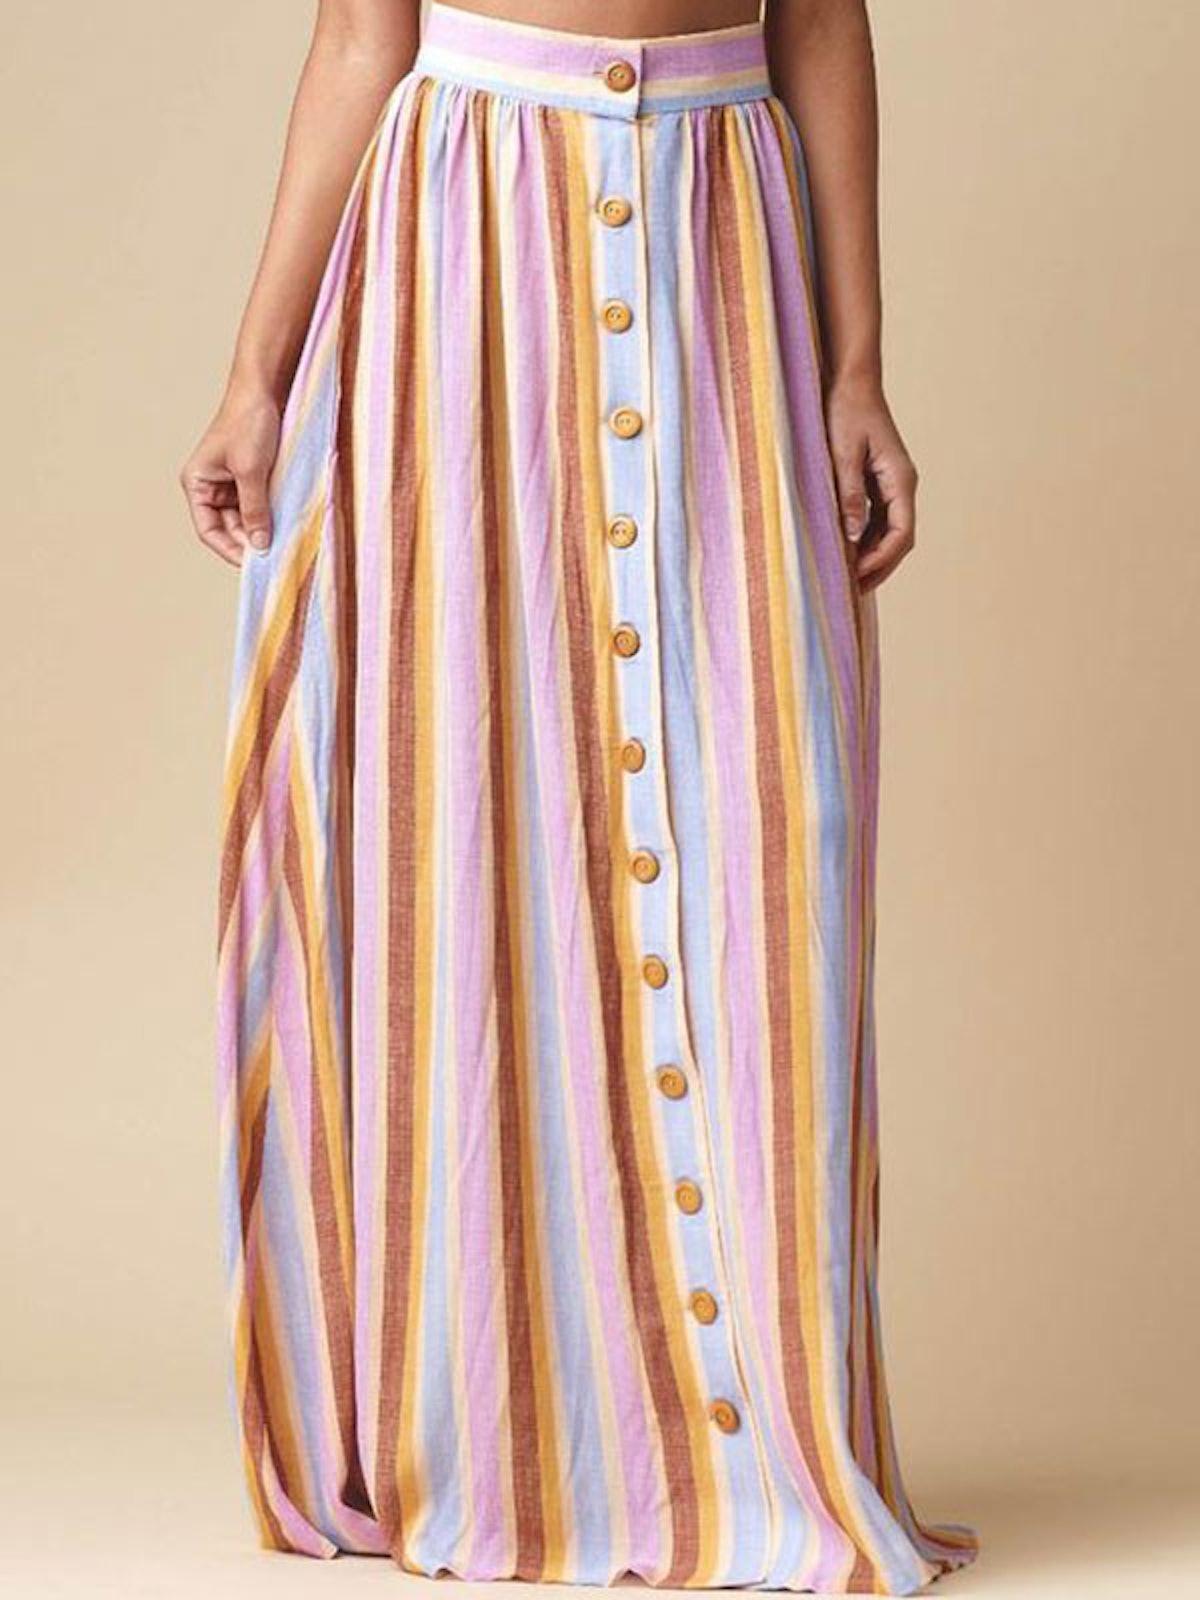 Mallorca Stripe Cotton Edith Skirt